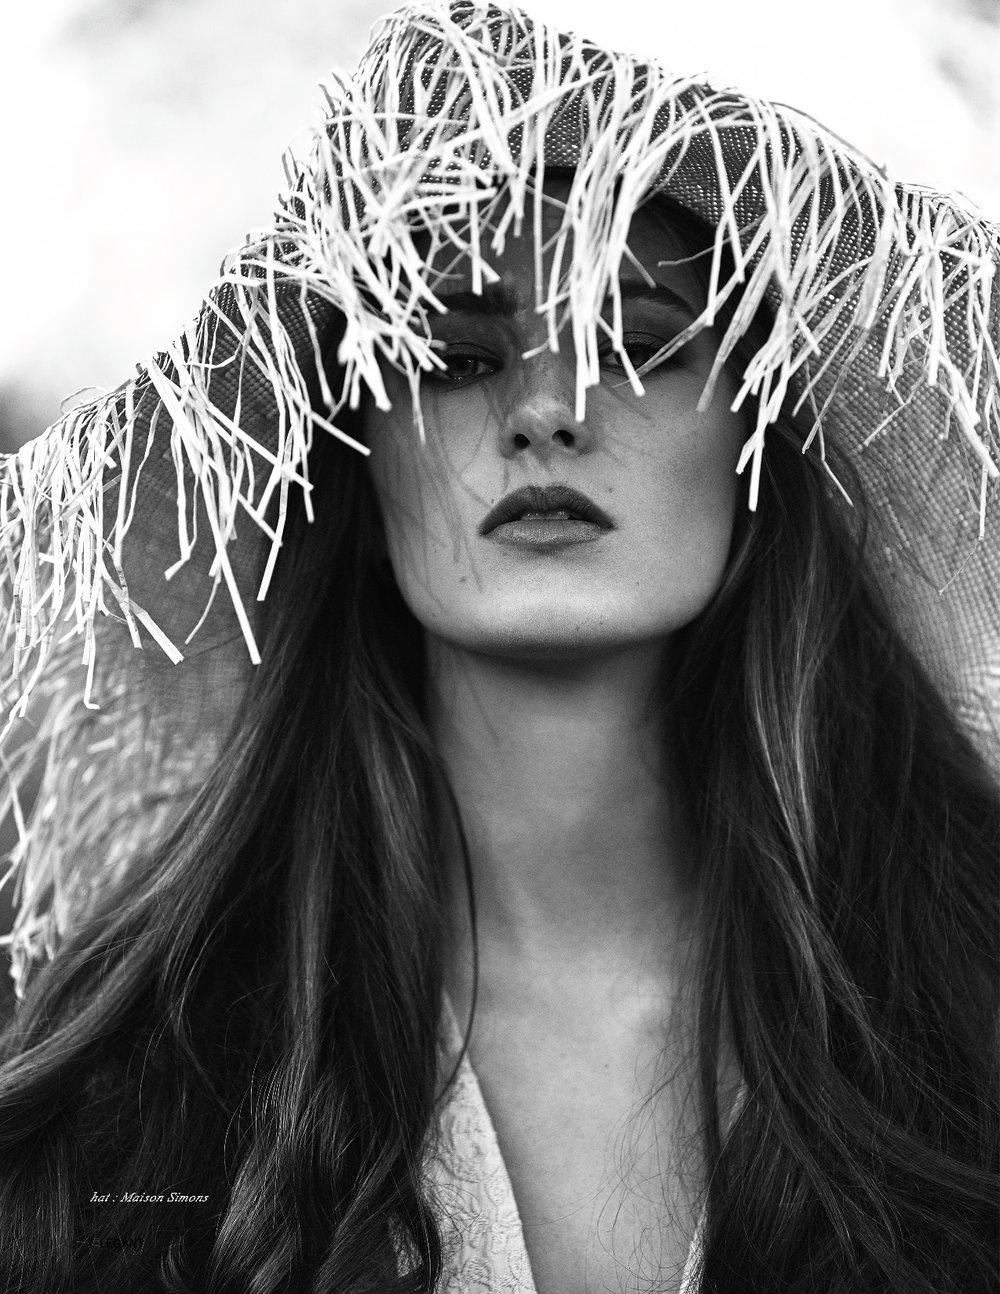 Emilie_Tournevache_Boheme_Fashion_Editorial_Photographer.jpg